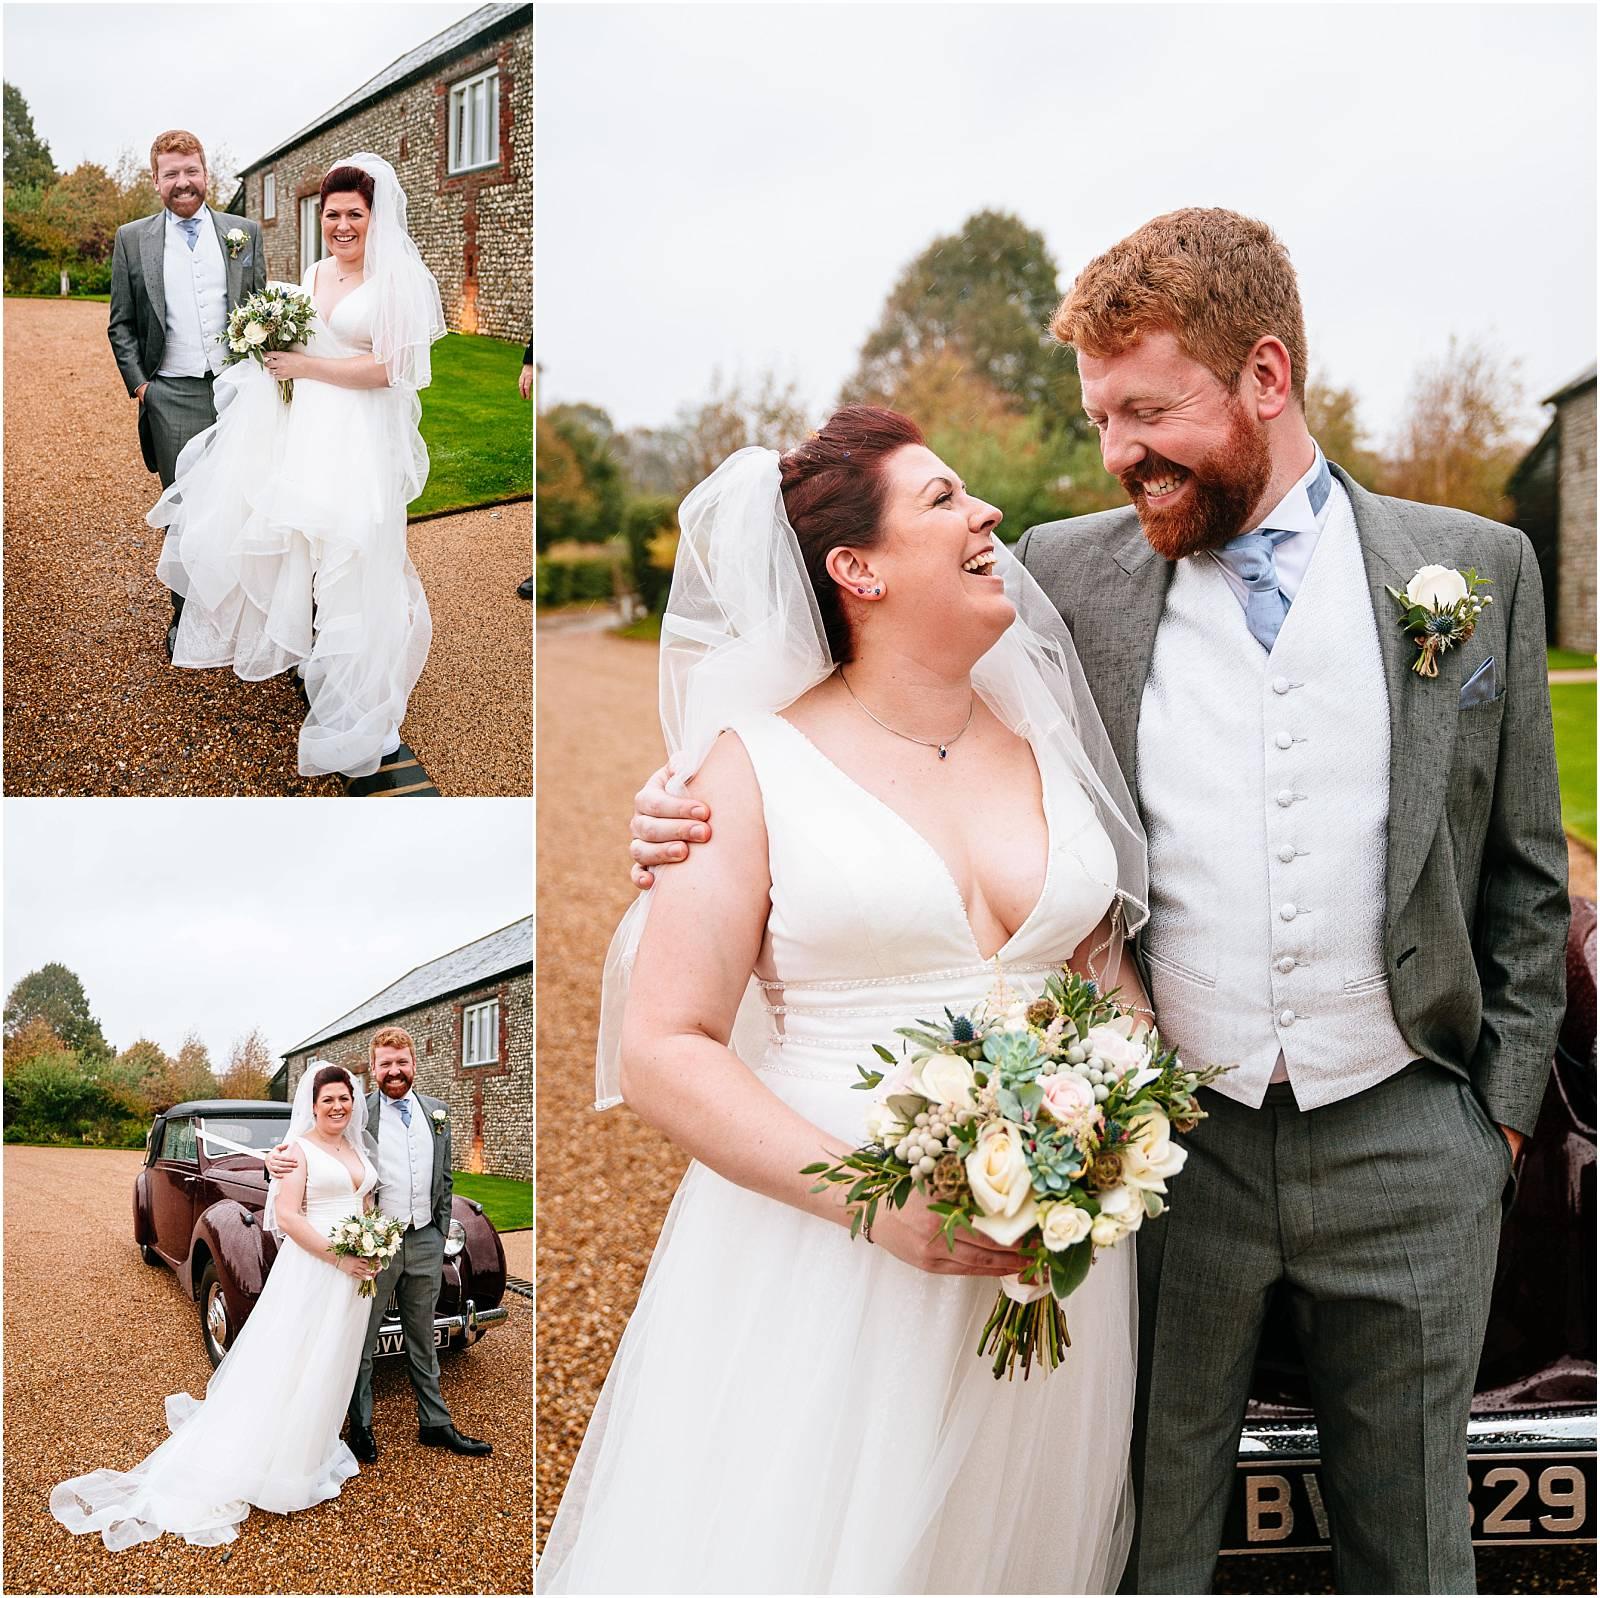 rainy Farbridge wedding photography